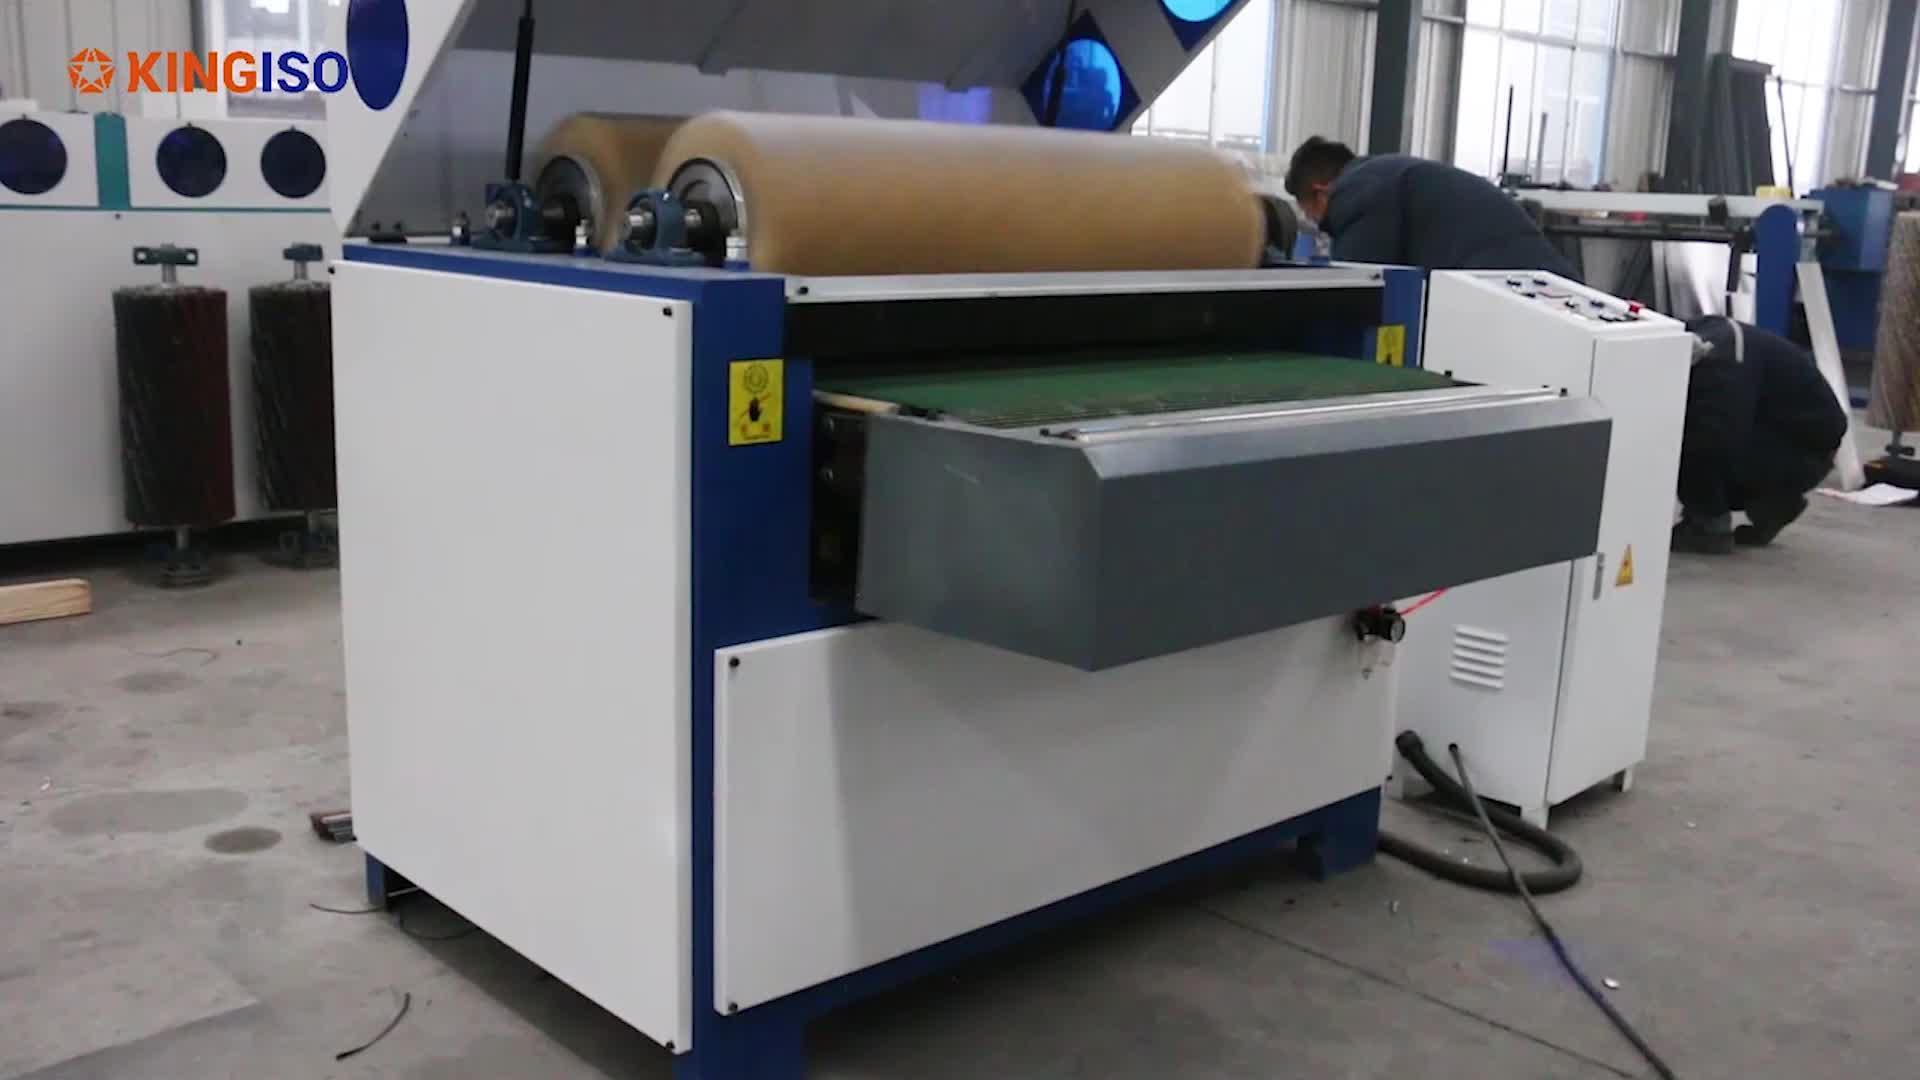 High quality Drum sanding machine Wood polishing machine KI1000R-R Polishing machine for solid door